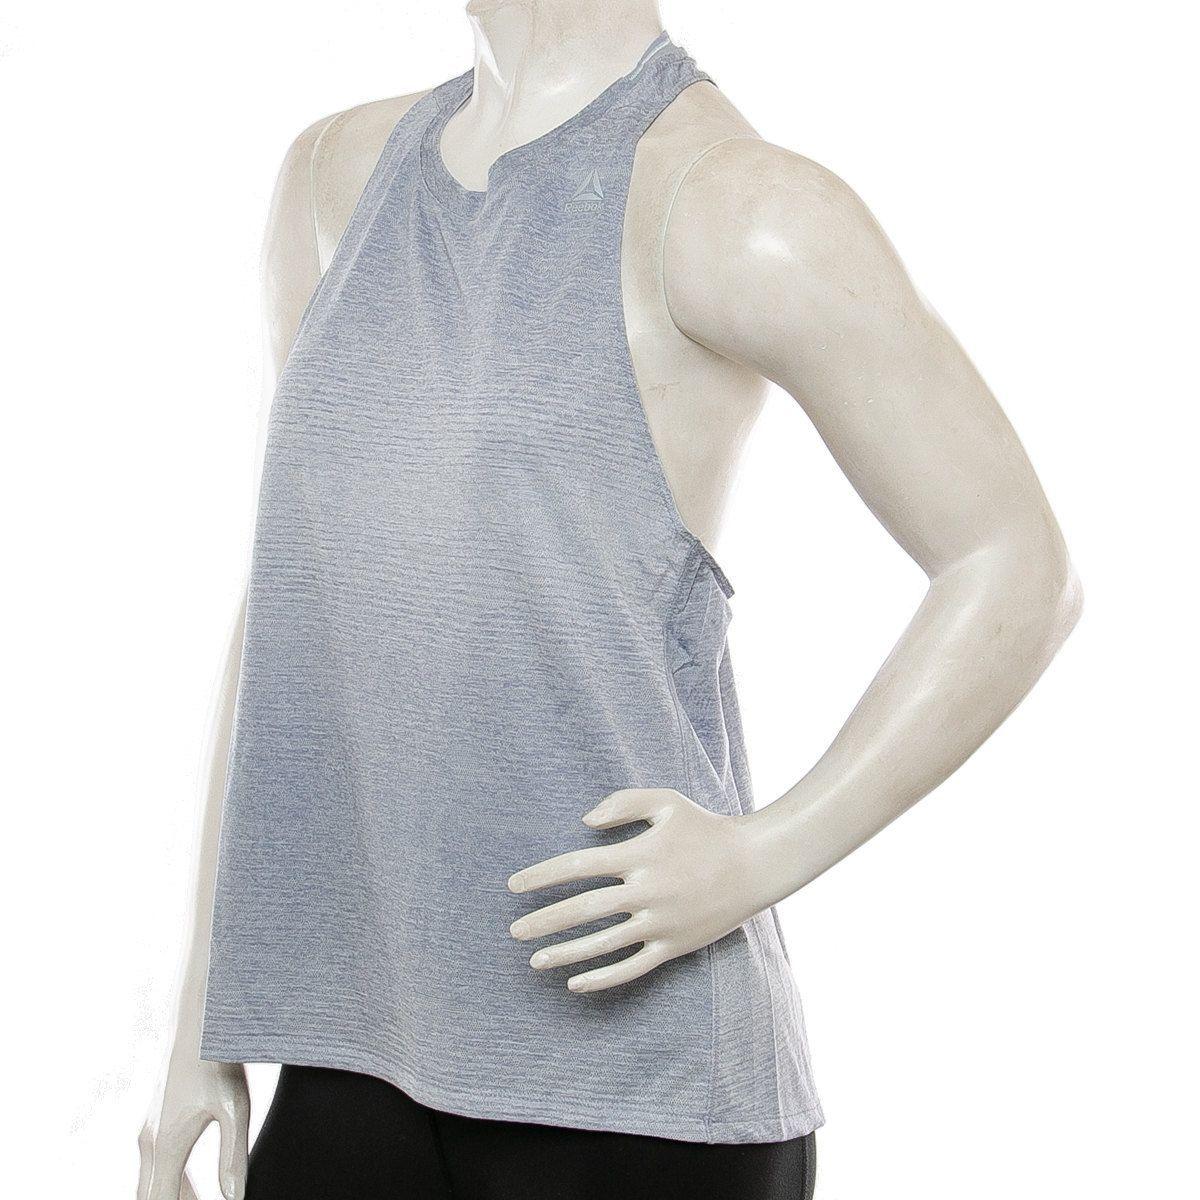 Reebok Women/'s One Series Running Knit Tank Top